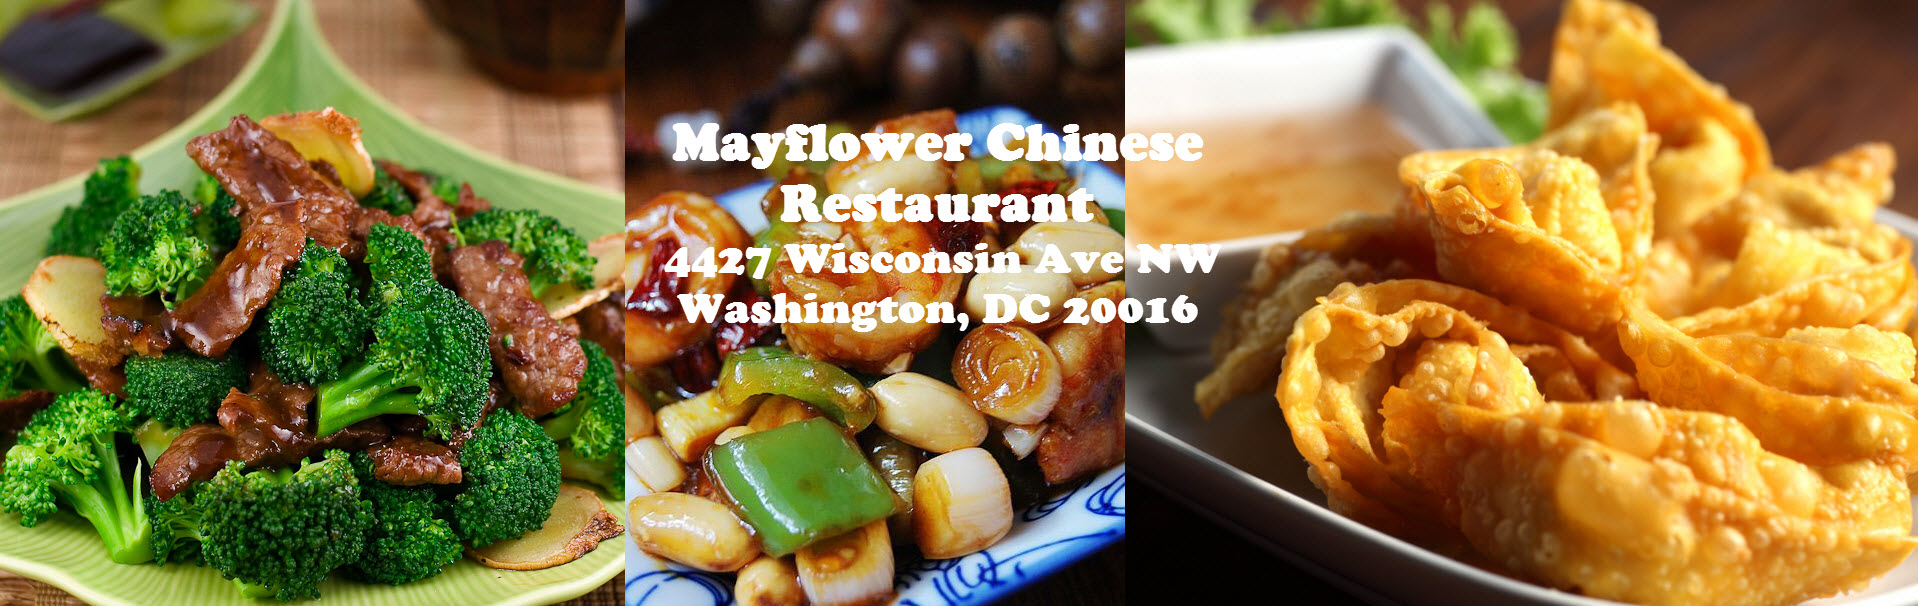 Mayflower Chinese Restaurant Order Online Washington Dc